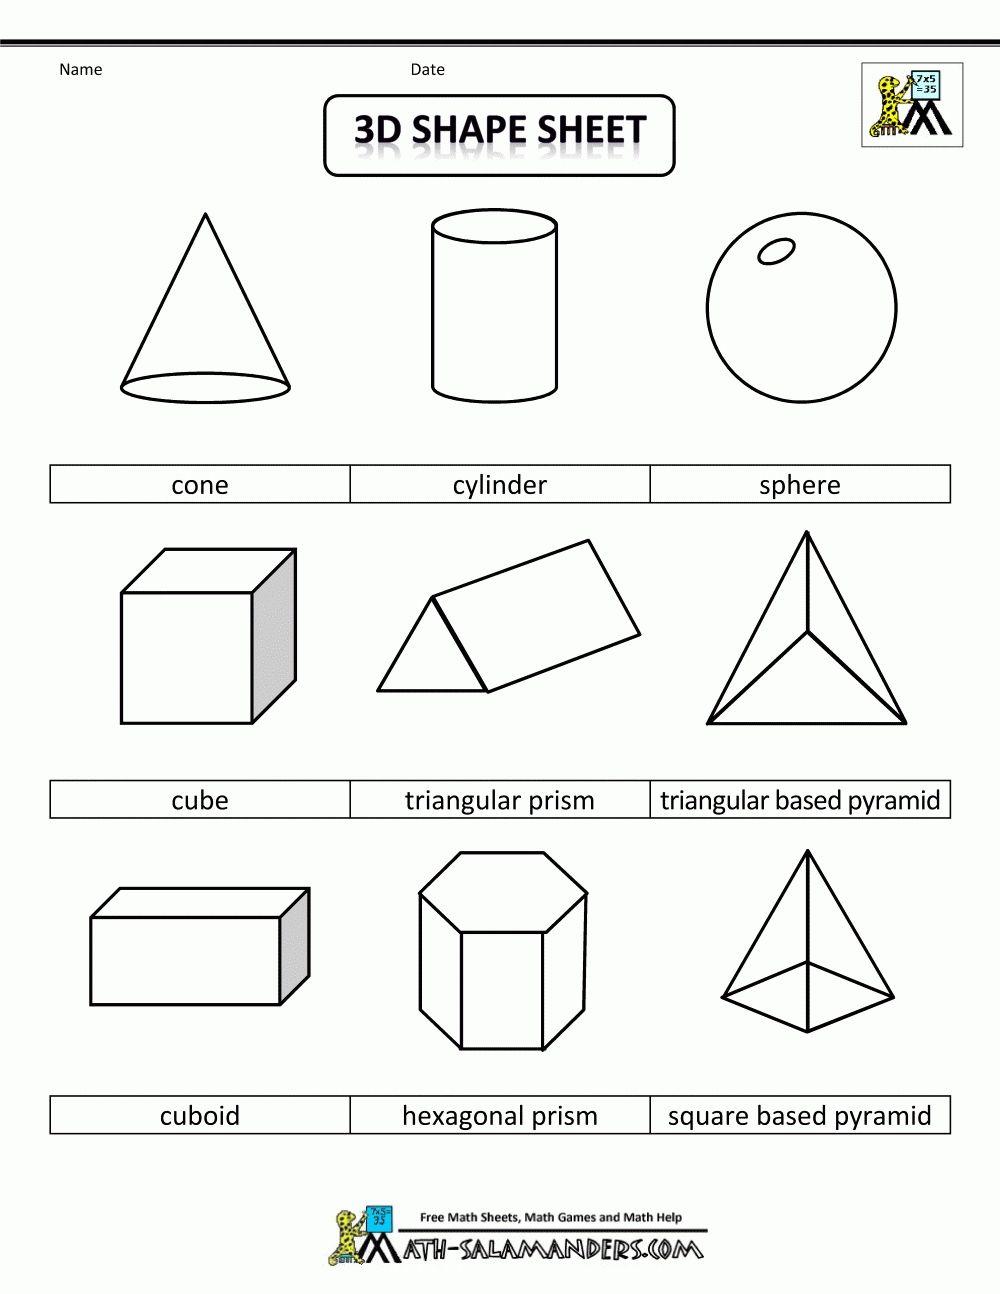 2d Geometric Shapes Chart Corner Of Chart And Menu 3d Shapes Worksheets Shapes Worksheets 3d Geometric Shapes